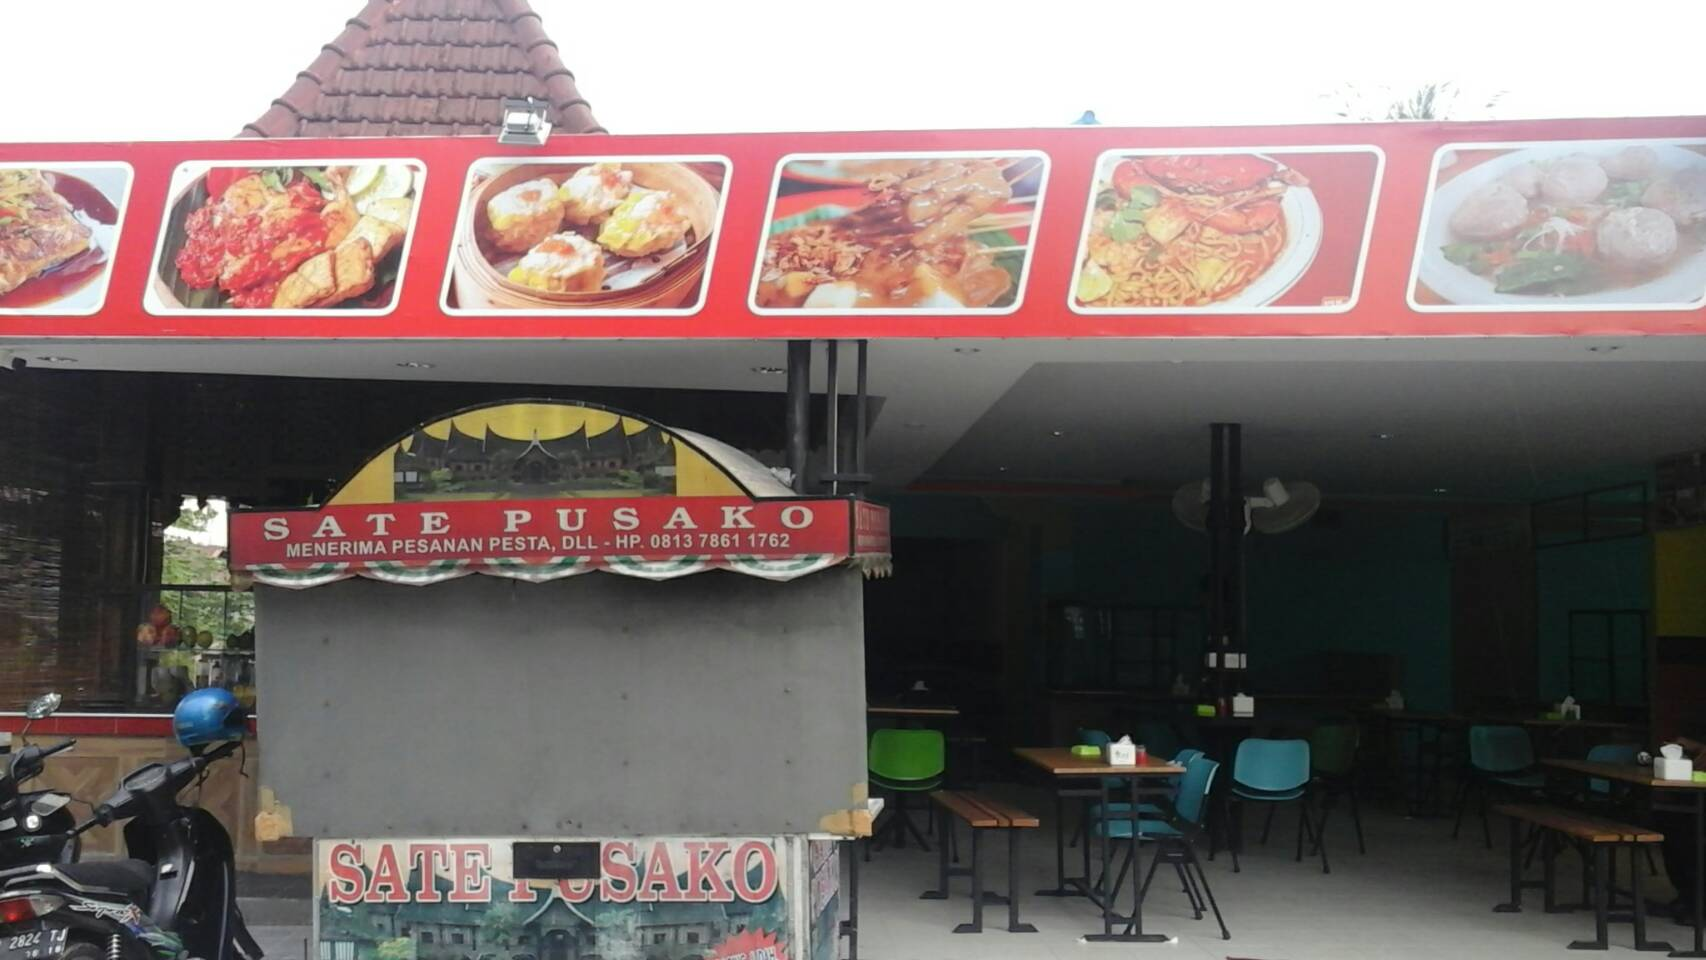 1504062140426 - Usaha Foodcourt And Coffee, Tempat Nongkrong Pekanbaru